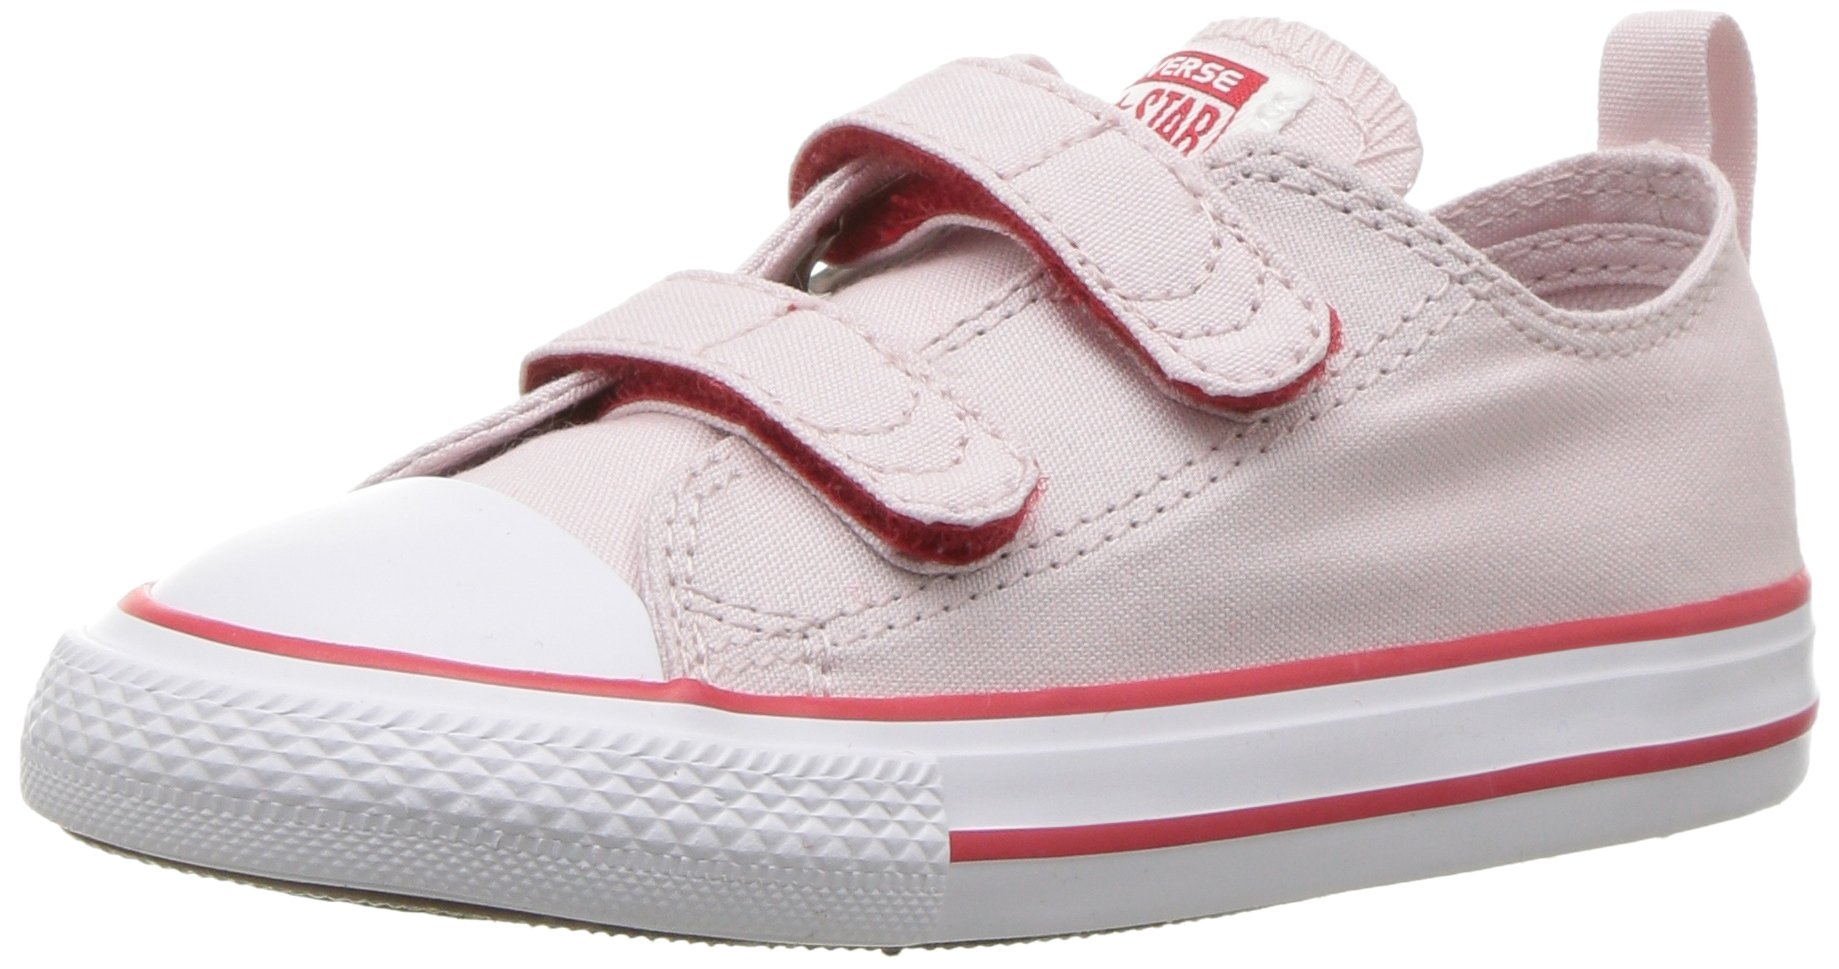 87b310873ce4 Galleon - Converse Kids  Chuck Taylor All Star 2V Seasonal Low Top Sneaker